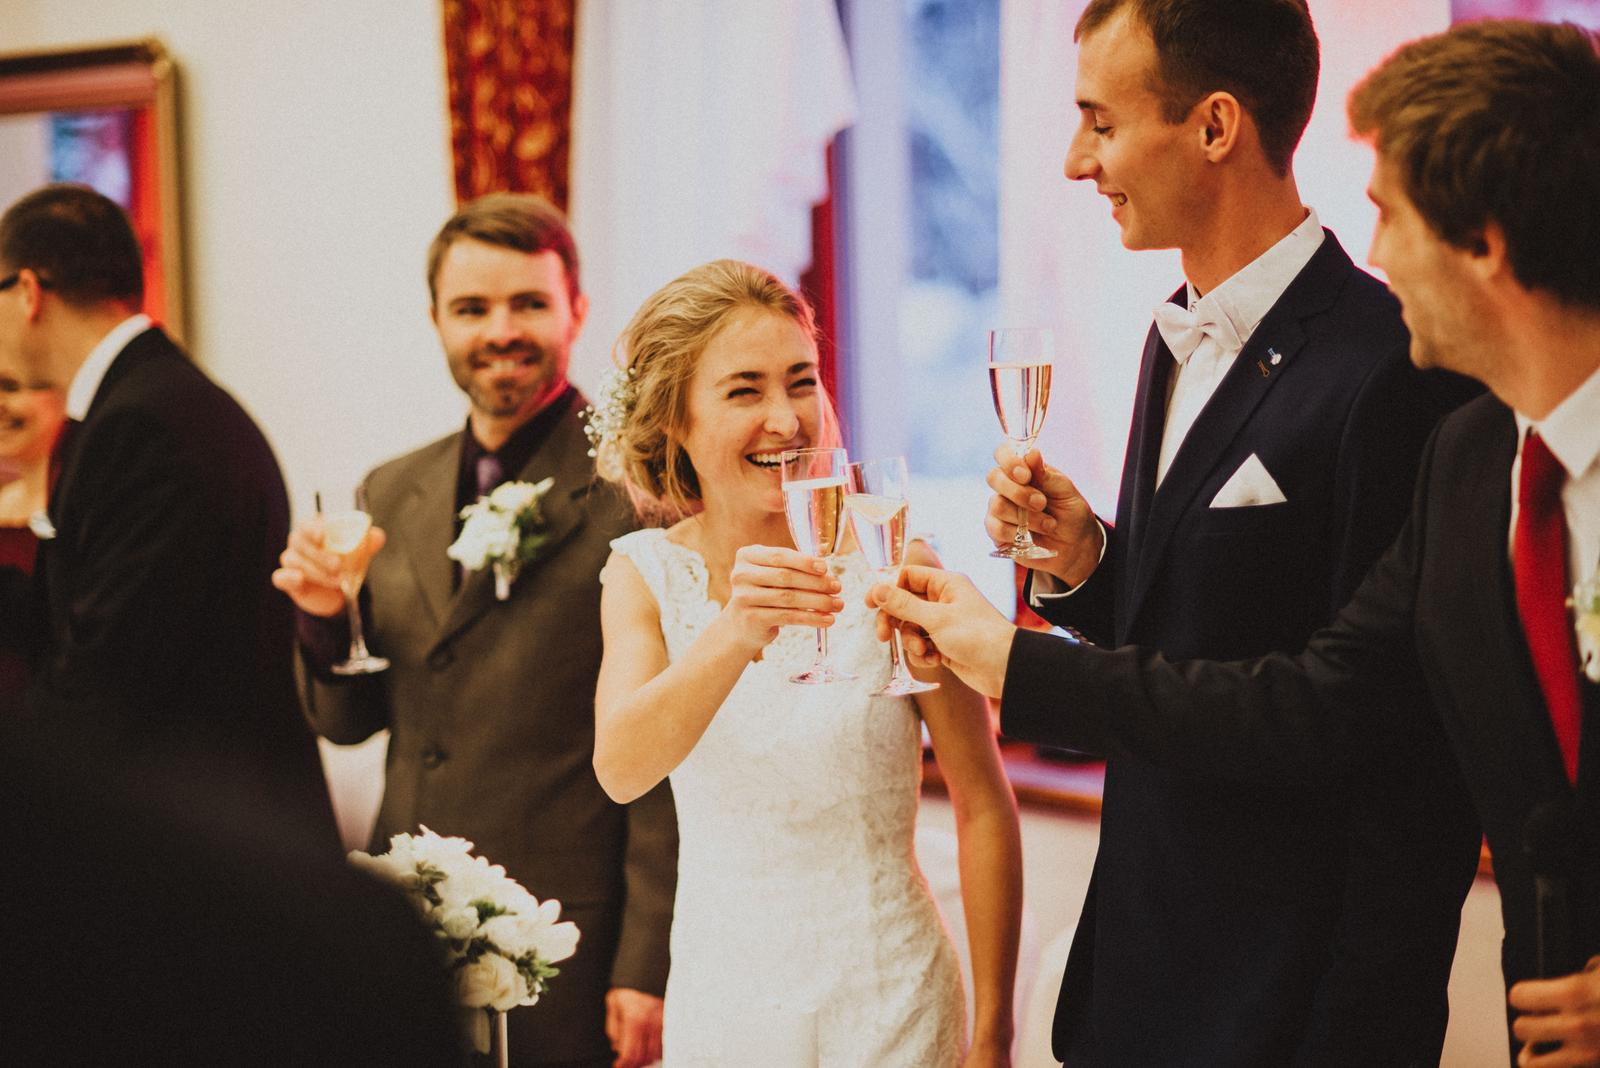 Tatranská zimná svadba - nazdravie